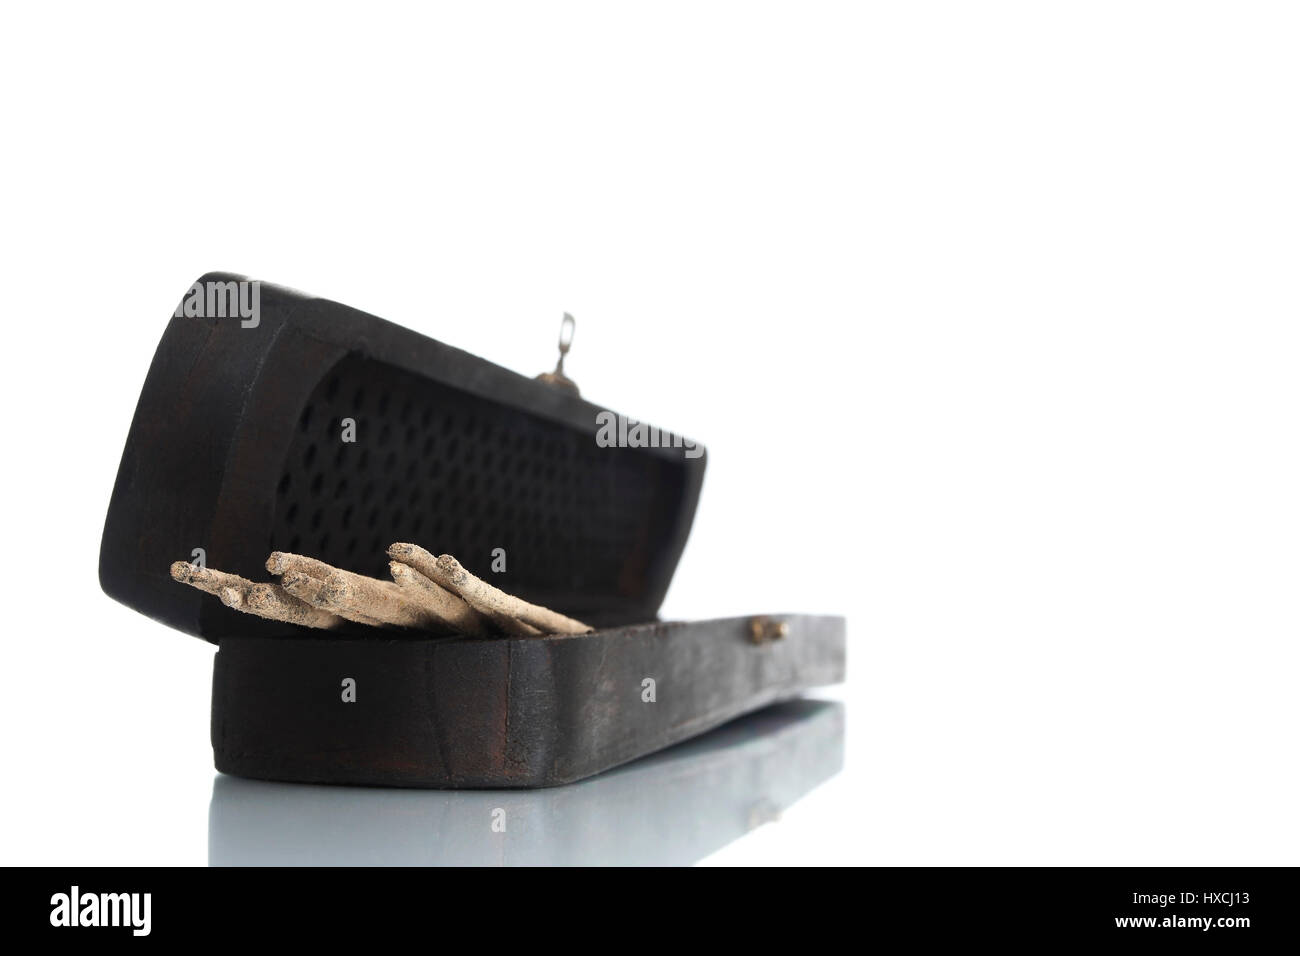 Wooden small boxes with joss stick, Holzkästchen mit Räucherstäbchen Stock Photo